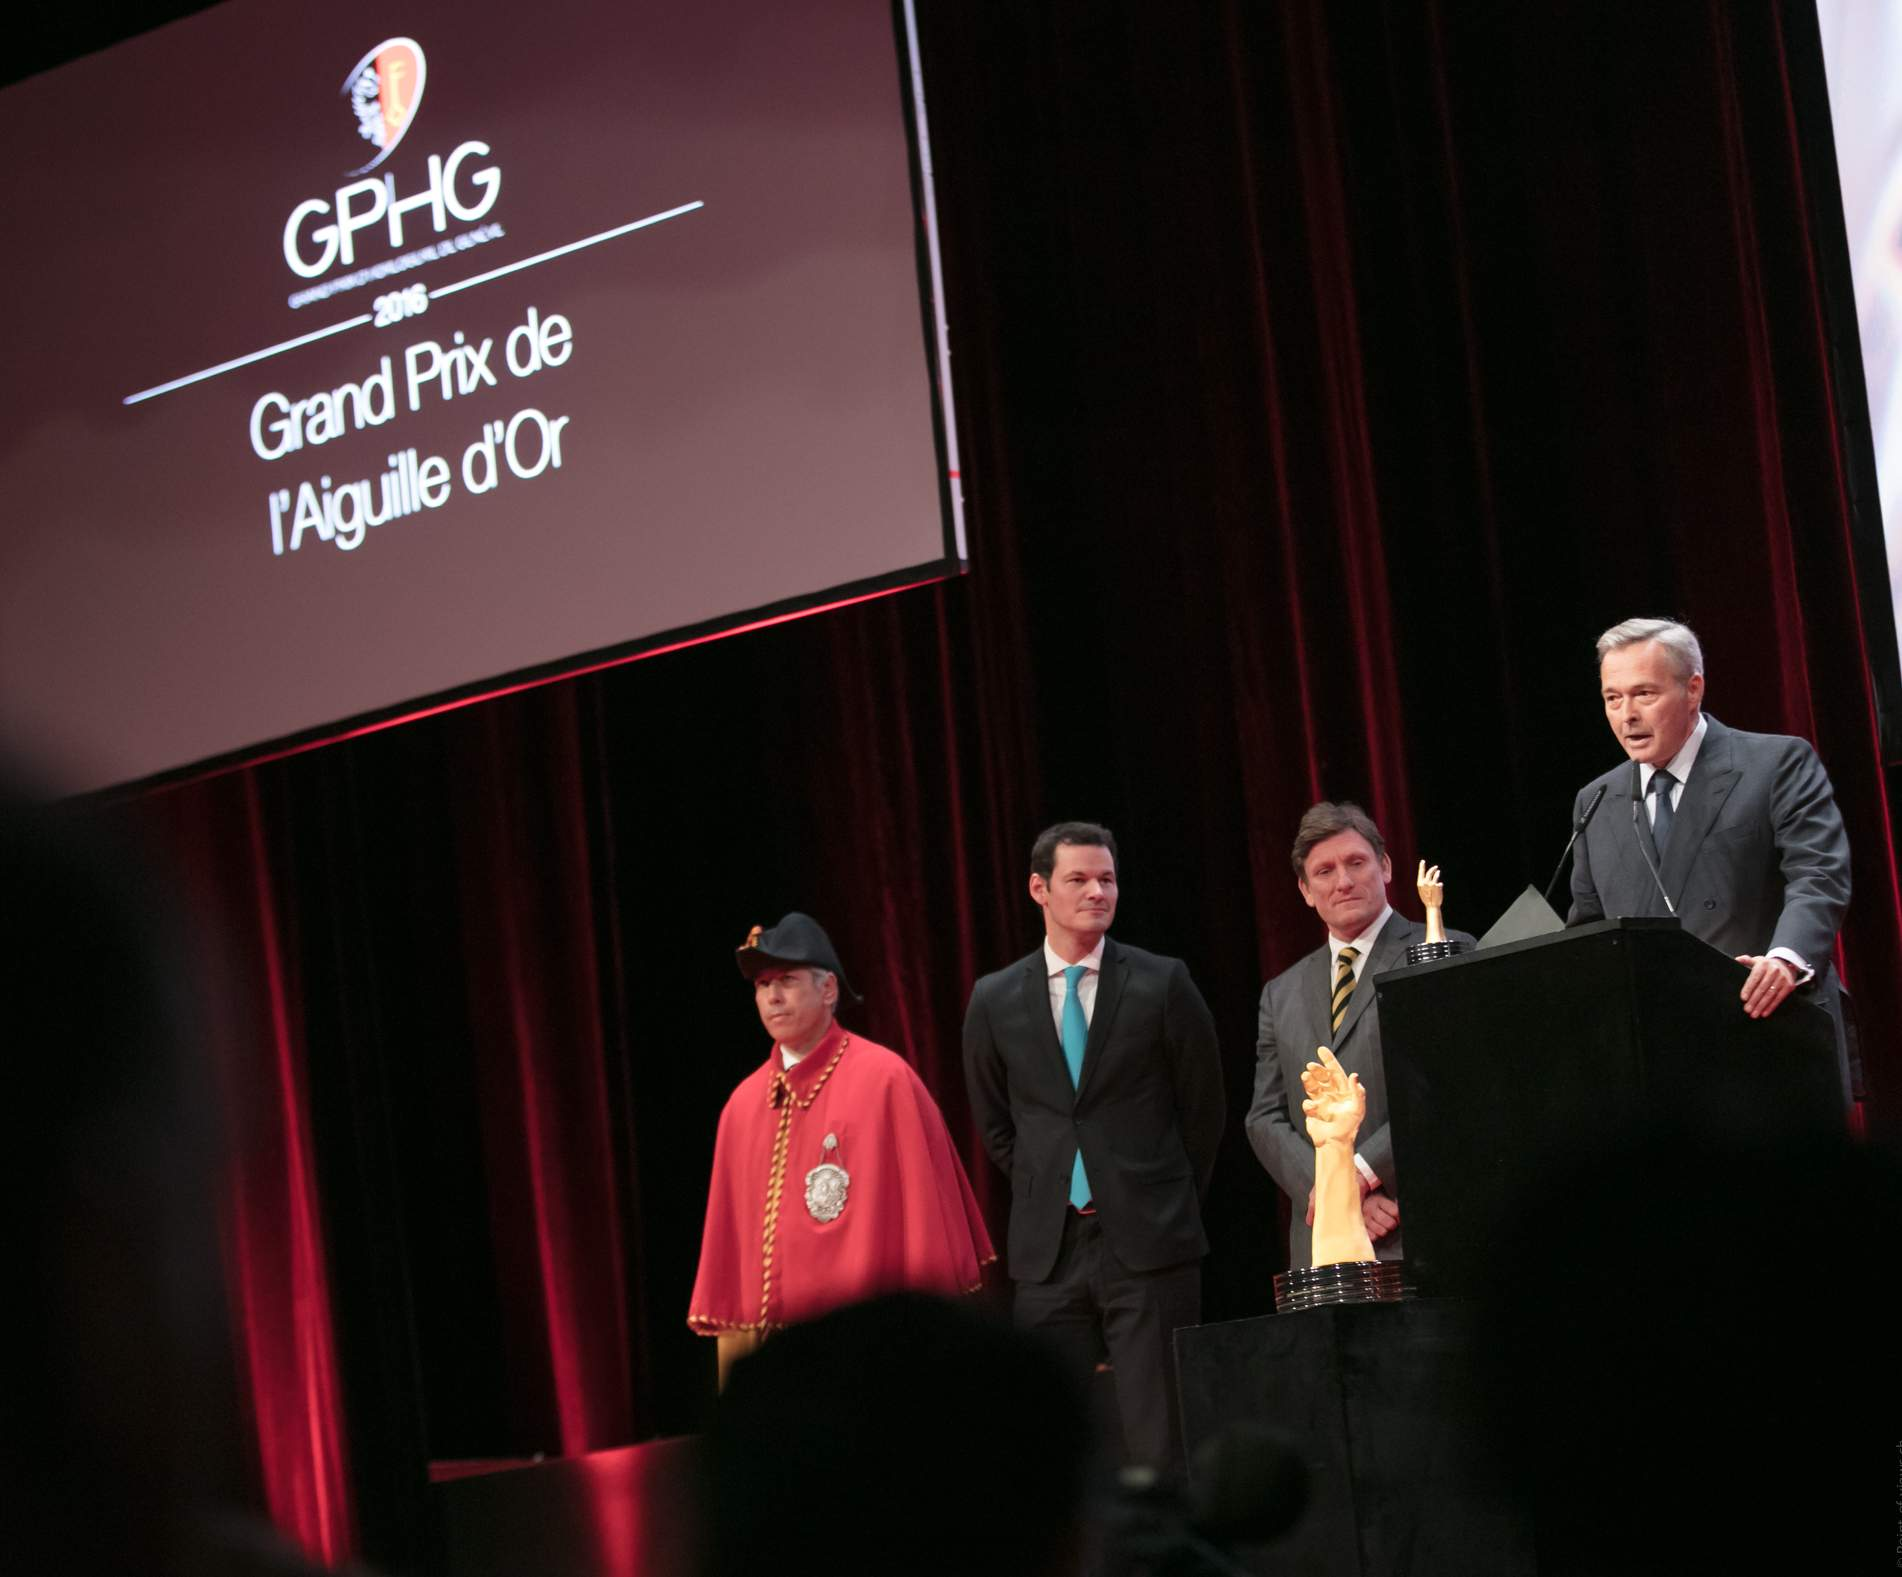 "Pierre Maudet (State Councillor), Steven Forsey (Co-founder of Greubel & Forsey) and Karl-Friedrich Scheufele  (President of Chronométrie Ferdinand Berthoud, winner of the ""Aiguille d'Or"" Grand Prix 2016)"